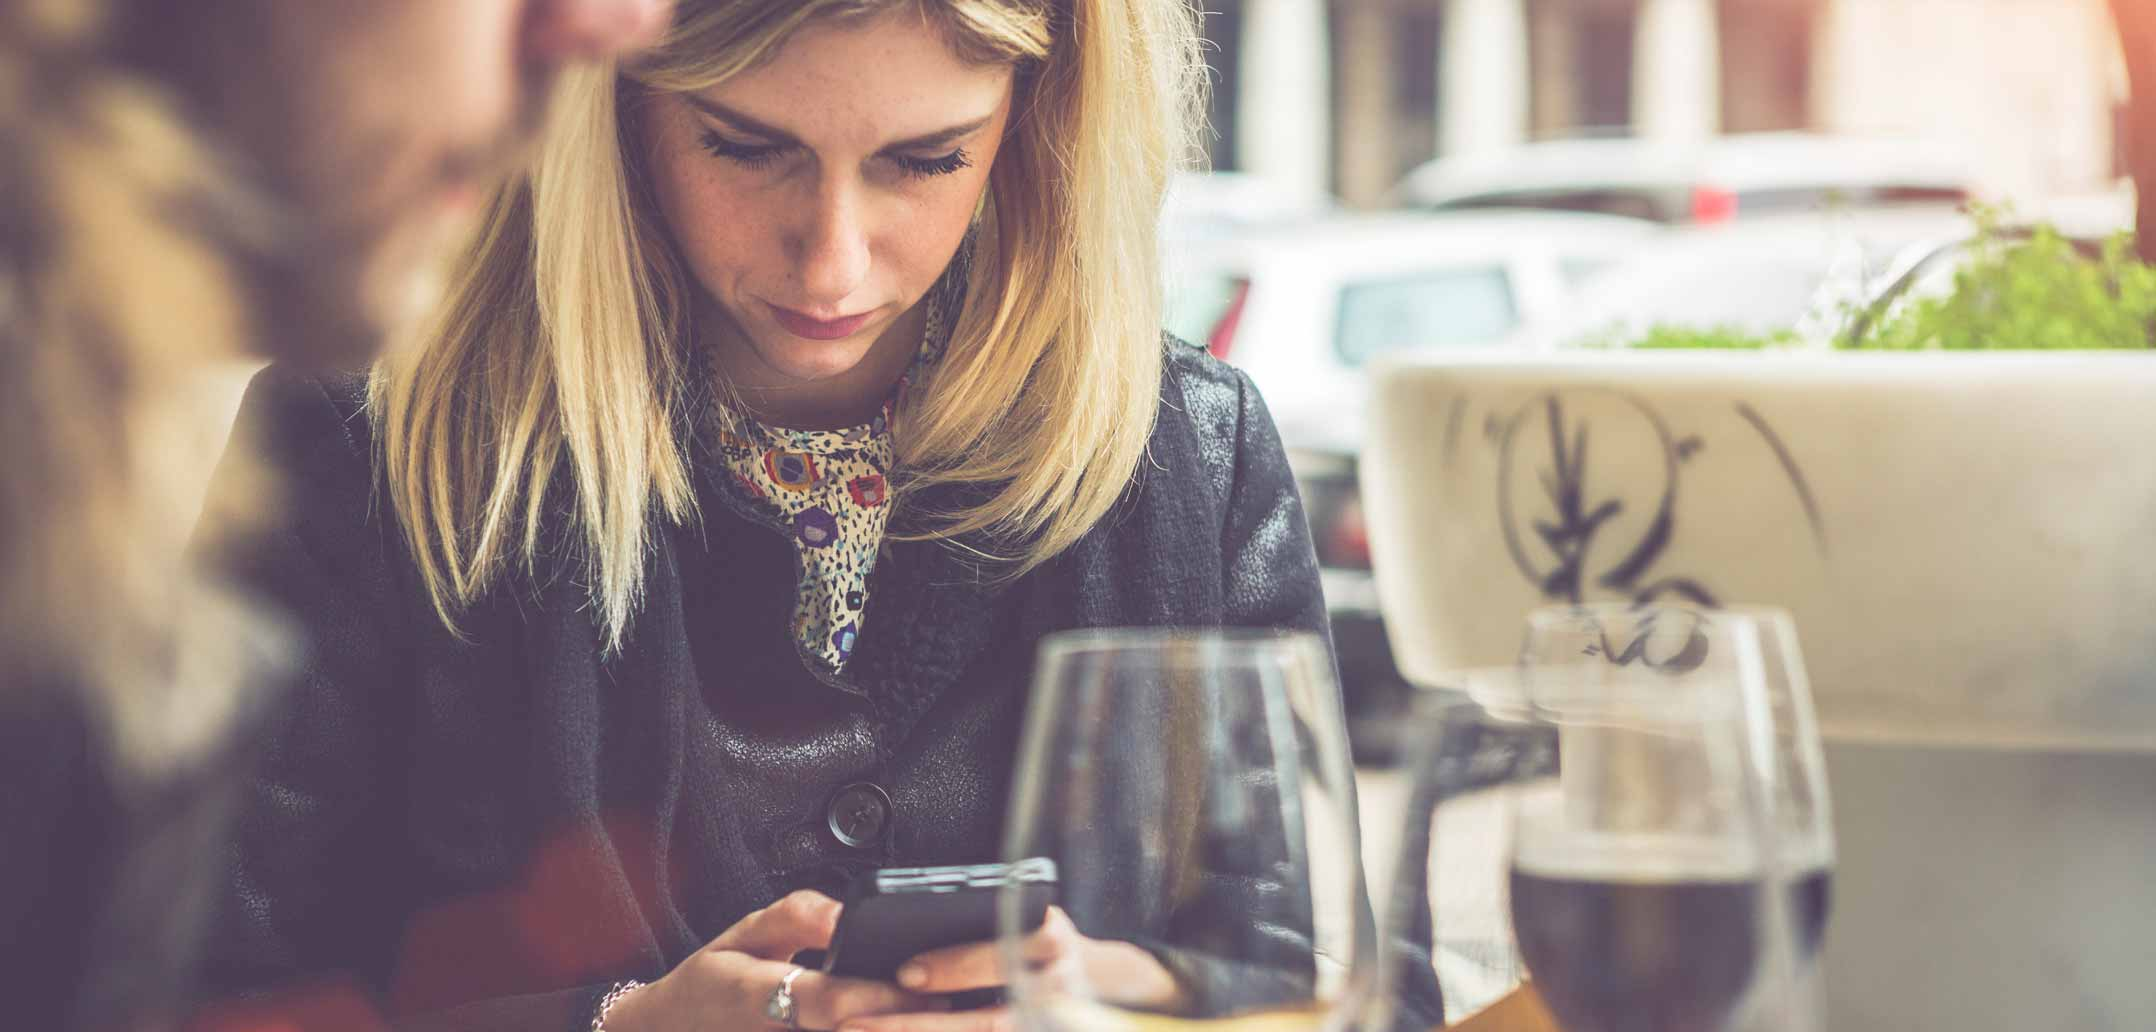 Ist ihr Date Social Media süchtig?